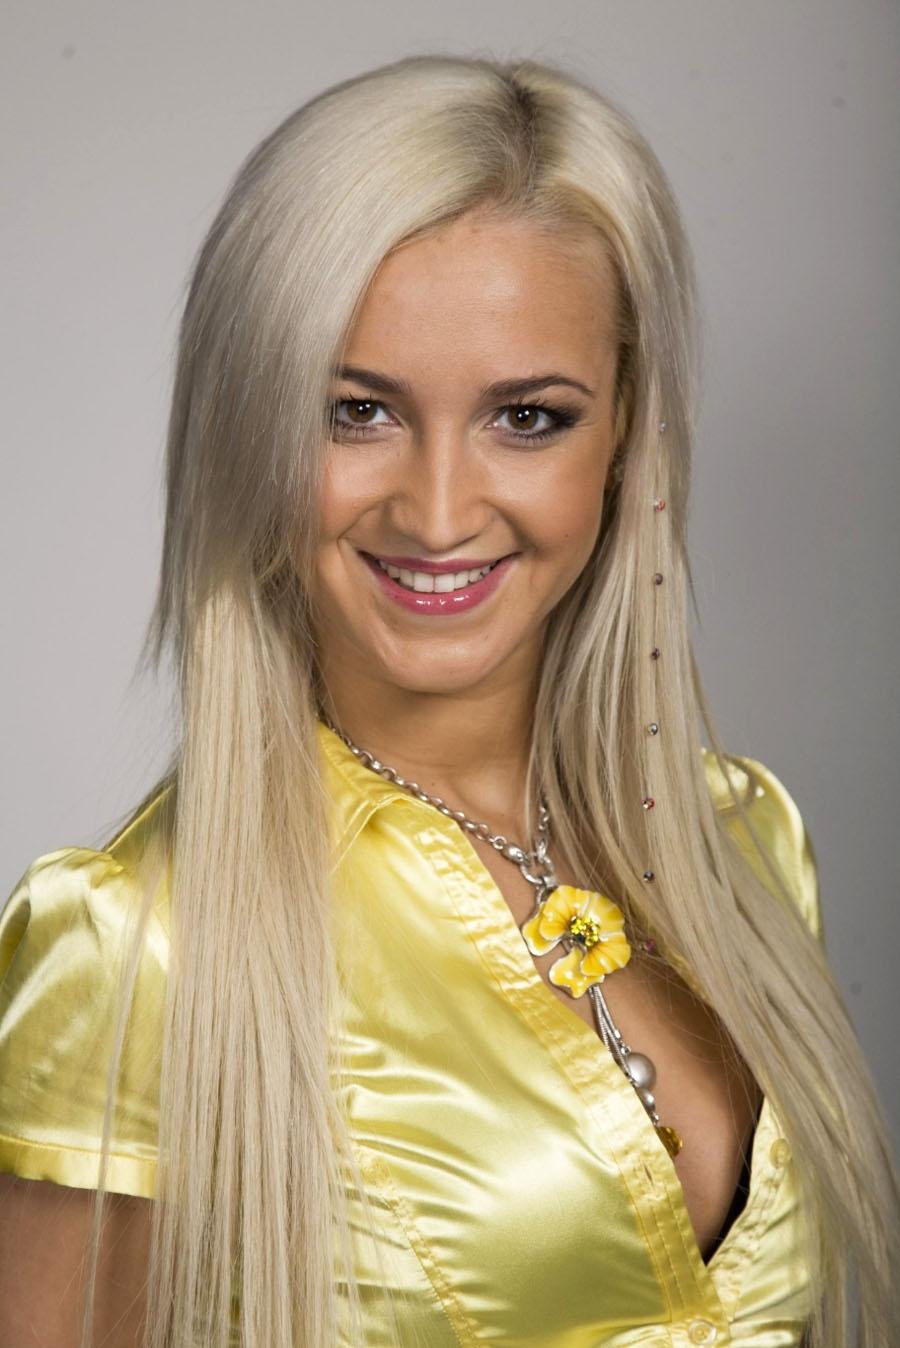 Olga-Buzova-Foto-1